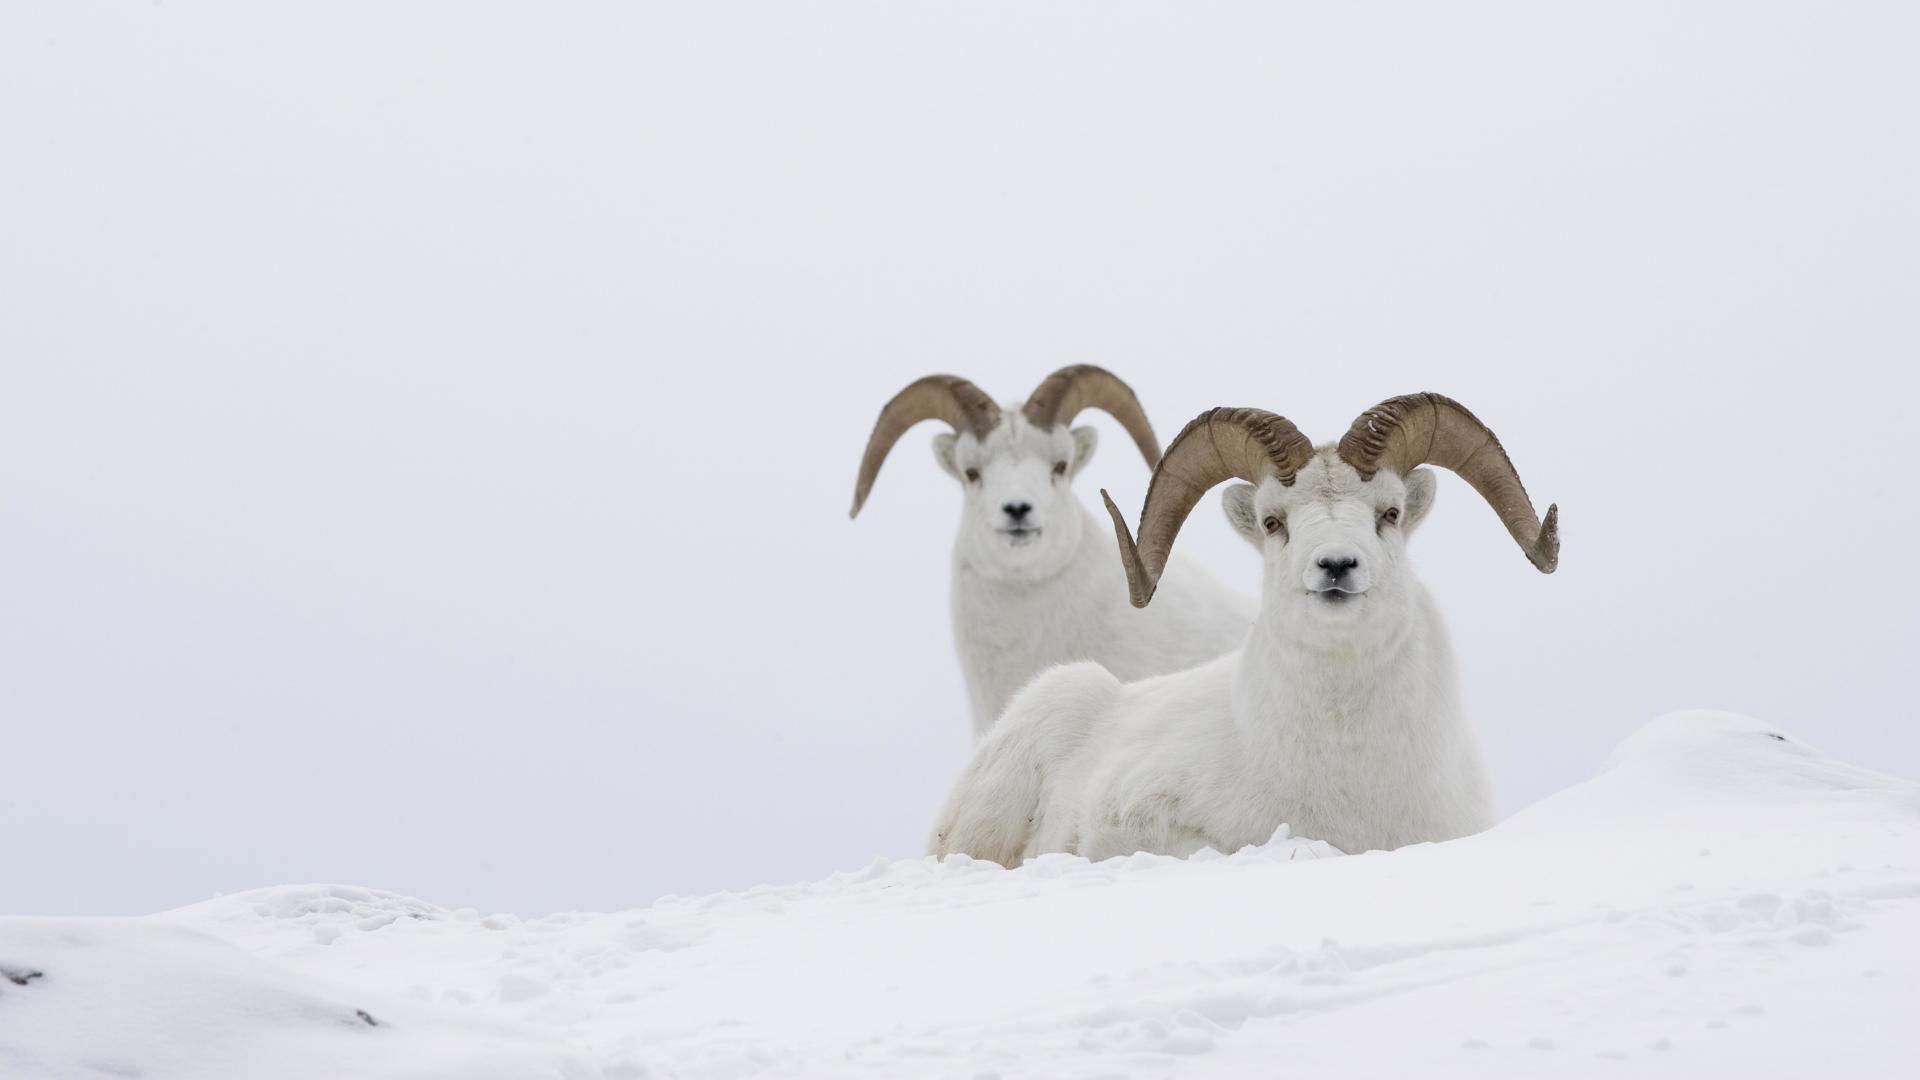 Winter animals wallpaper – photo#4